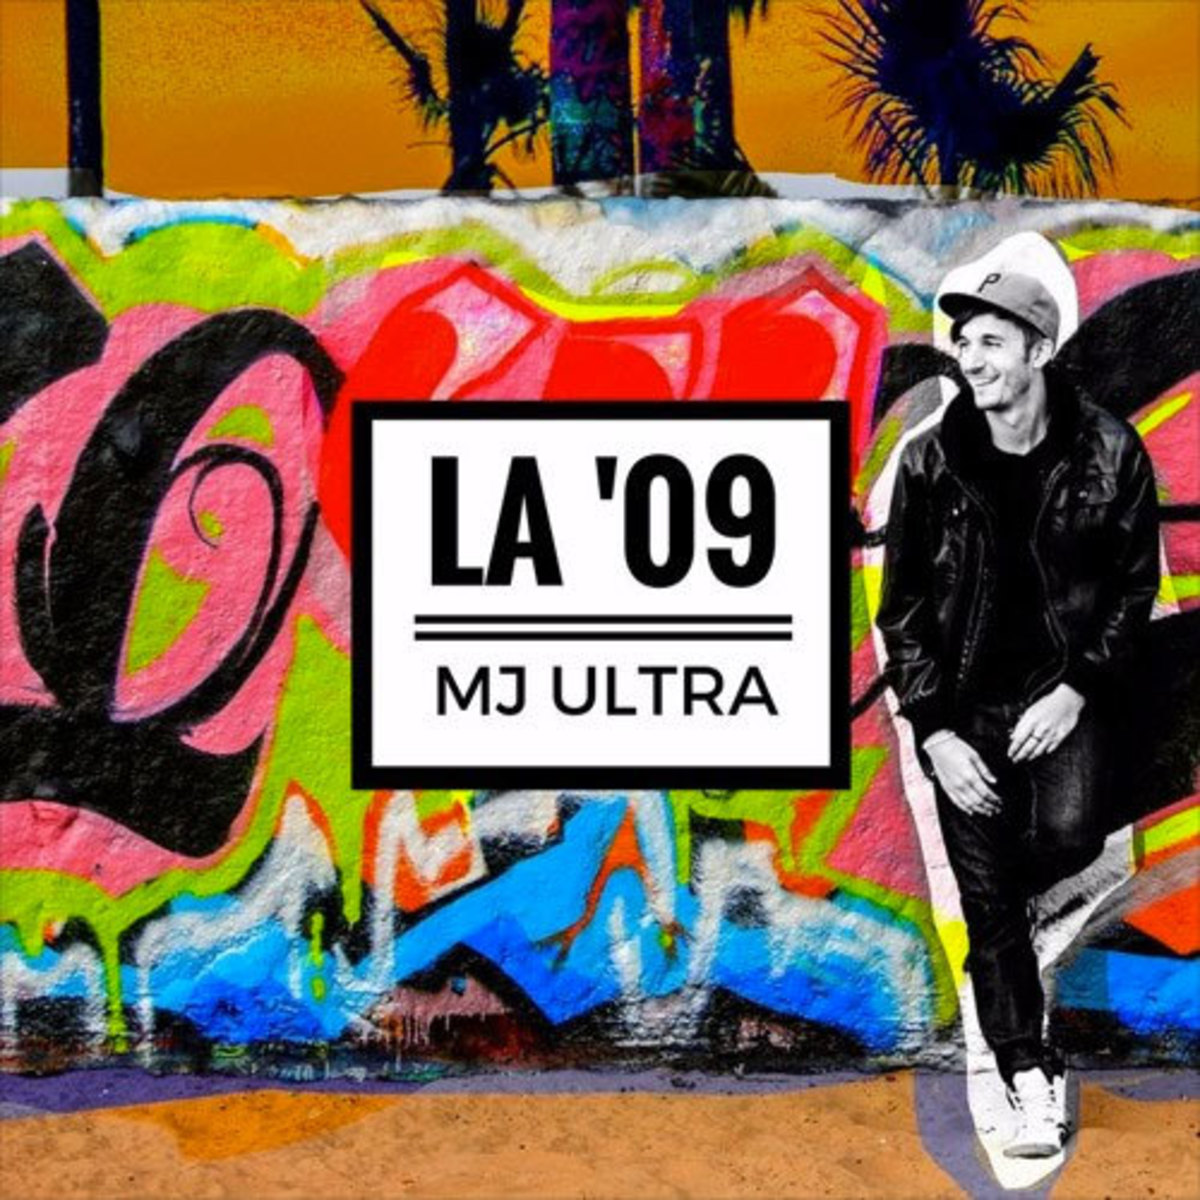 mj-ultra-la-09.jpg